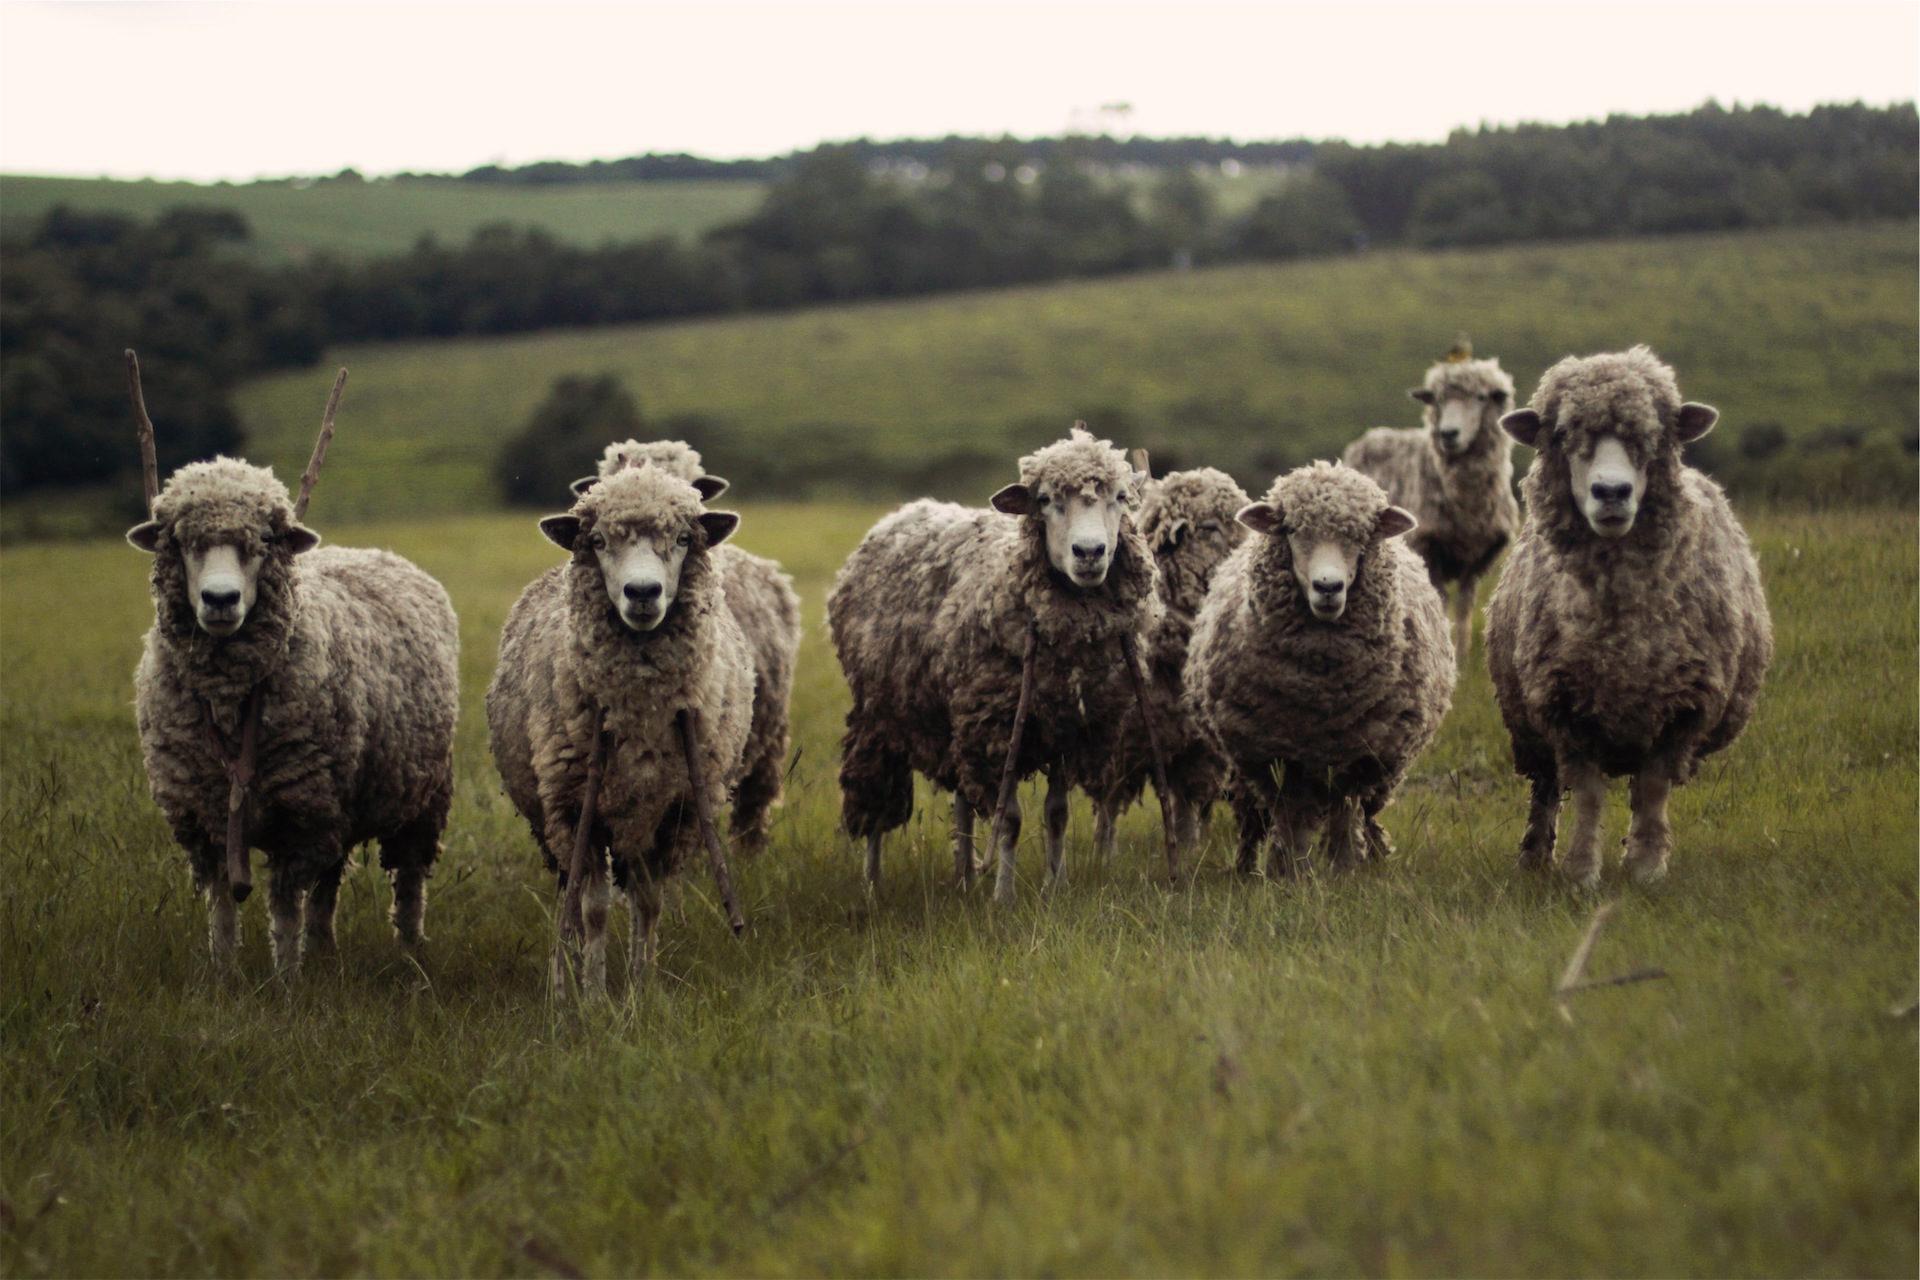 Schafe, Herde, Feld, Pradera, sieht - Wallpaper HD - Prof.-falken.com